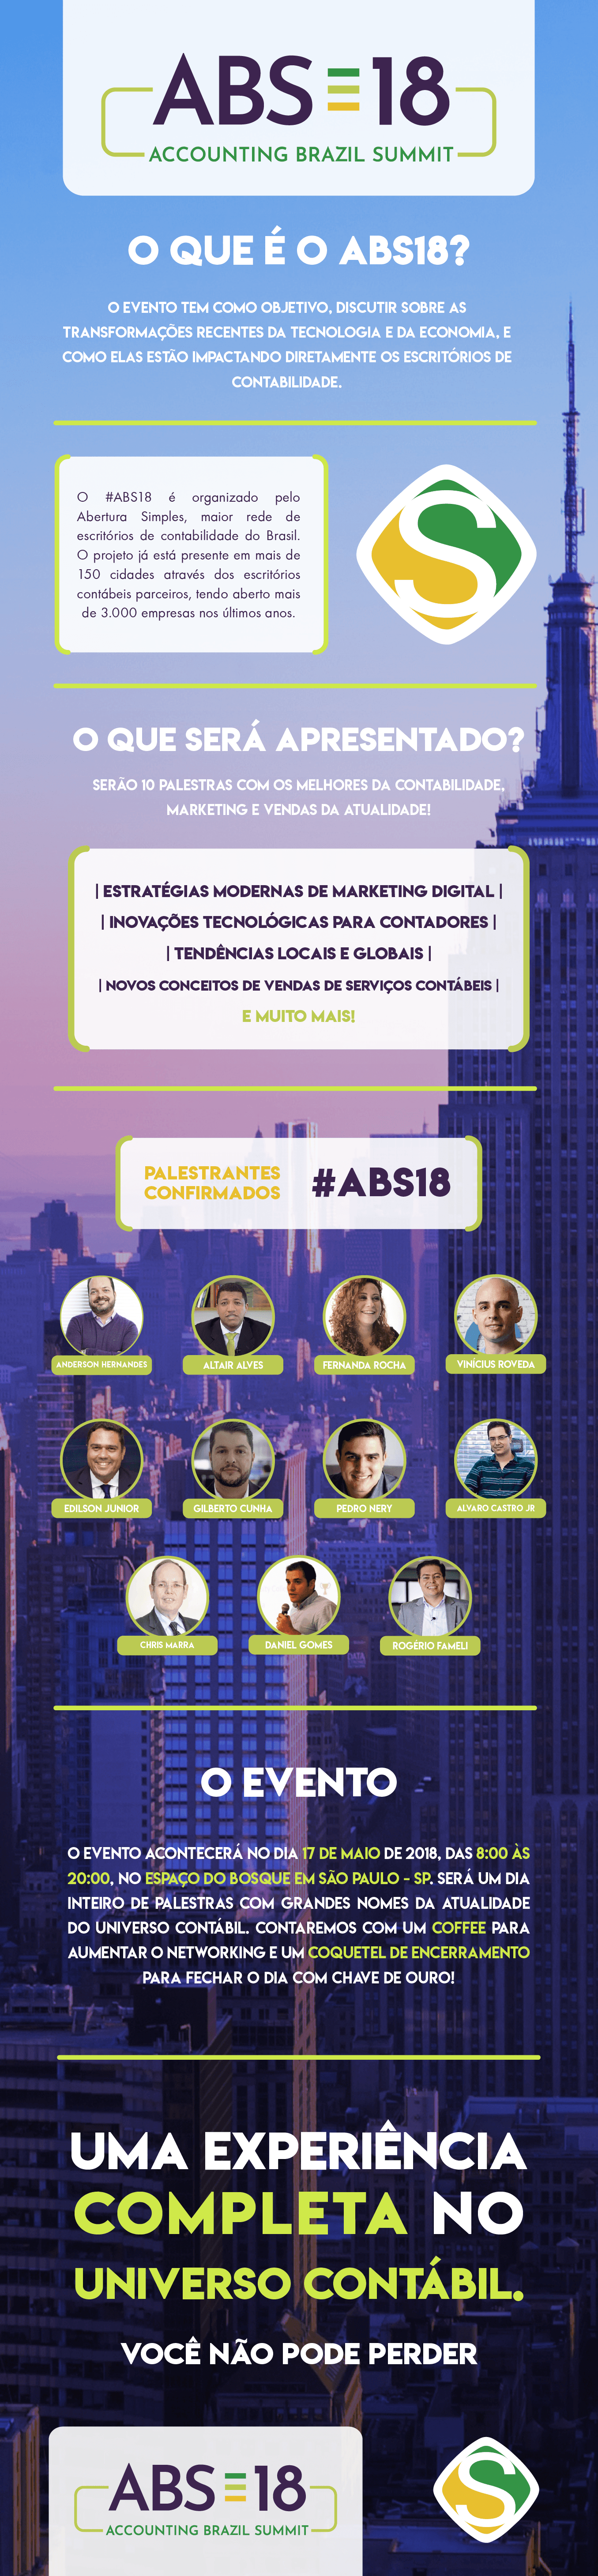 Infografico do evento ABS18 - Accounting Brazil Summit